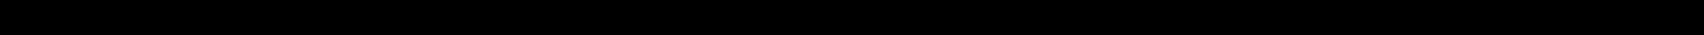 http://x-lines.ru/letters/i/cyrillicscript/0086/000000/22/0/4npnbwf74n47bxgtocopbxgoz5empwf74n9nbwf64na7dygosdeauwfo4gbpddgto8ea6egoz9emhegosmem7wf94gypbxsto8embwfhrdemxwfw4n9pdygoz5emfwcc4g81bwf14napdngozdeakegosuemmwcn4n47bqjc4n3pbxsoszem5wf74n9pdyqozxea8wfs4napdnqozdeakegowmembwfh4napbxqto8emiwf64nh1bwfw4nhpbcsozdemxwfa4nhy.png